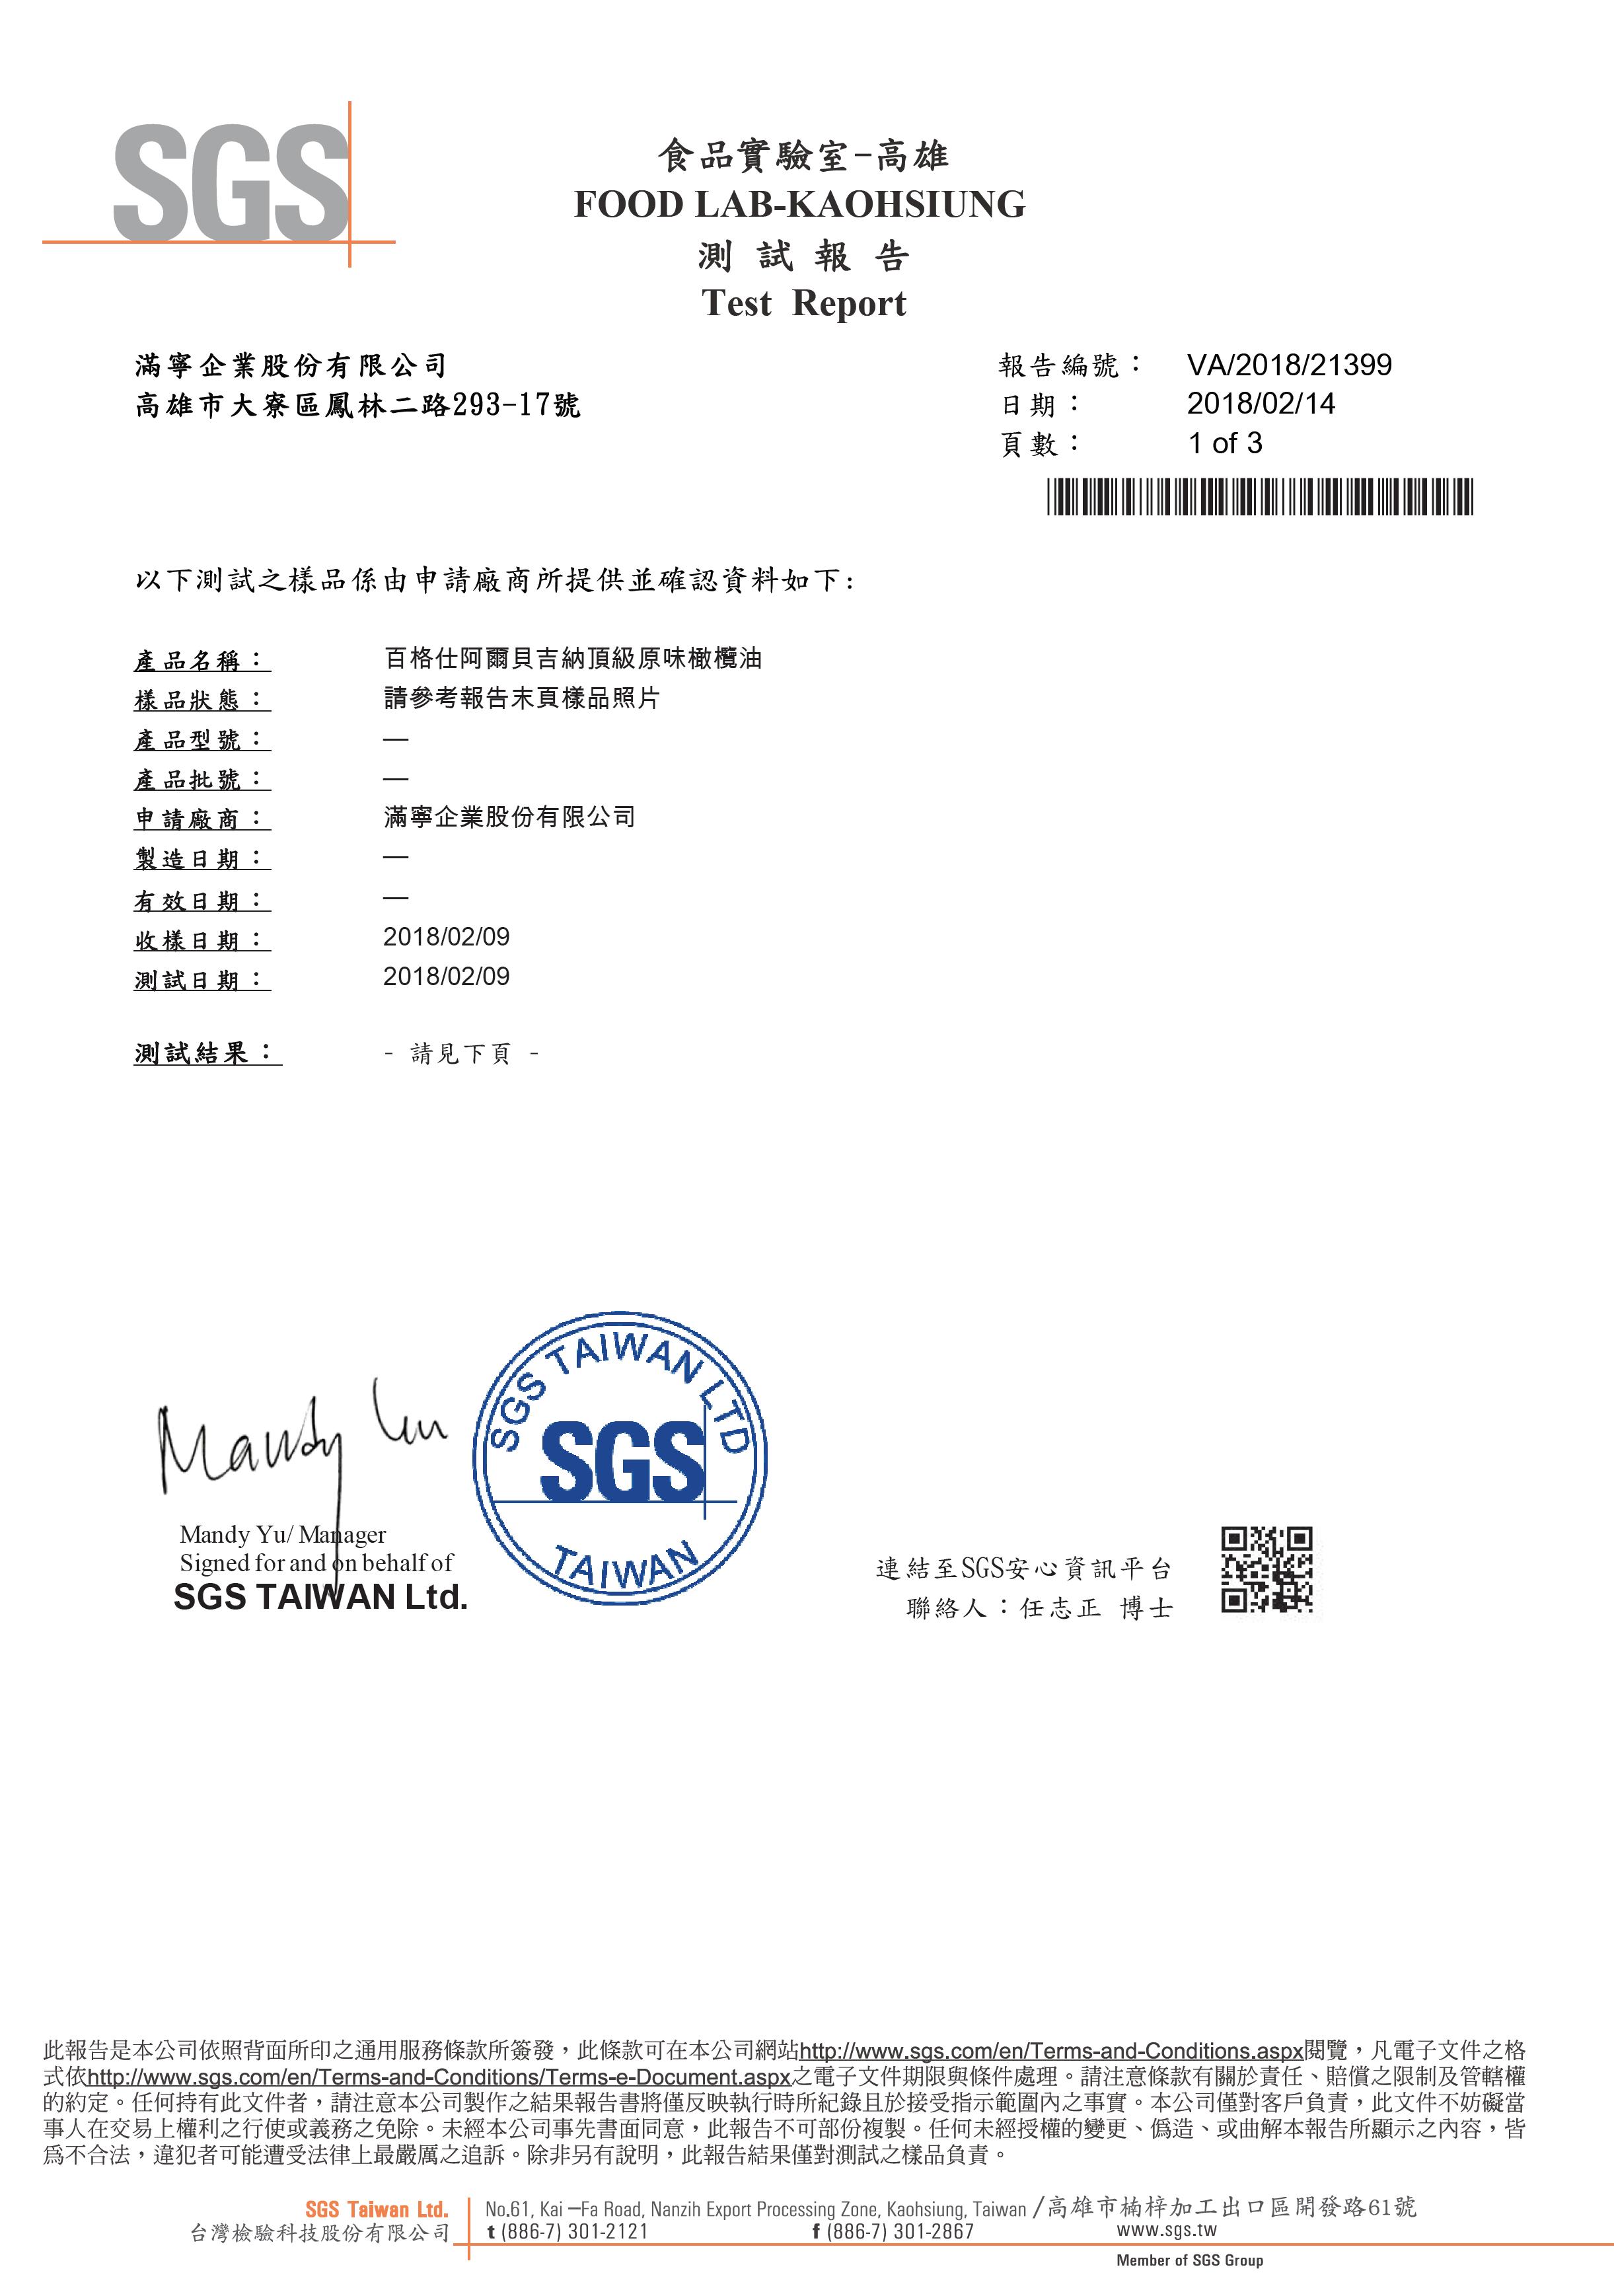 【SGS檢驗報告】百格仕阿爾貝吉納橄欖油,經SGS檢驗合格